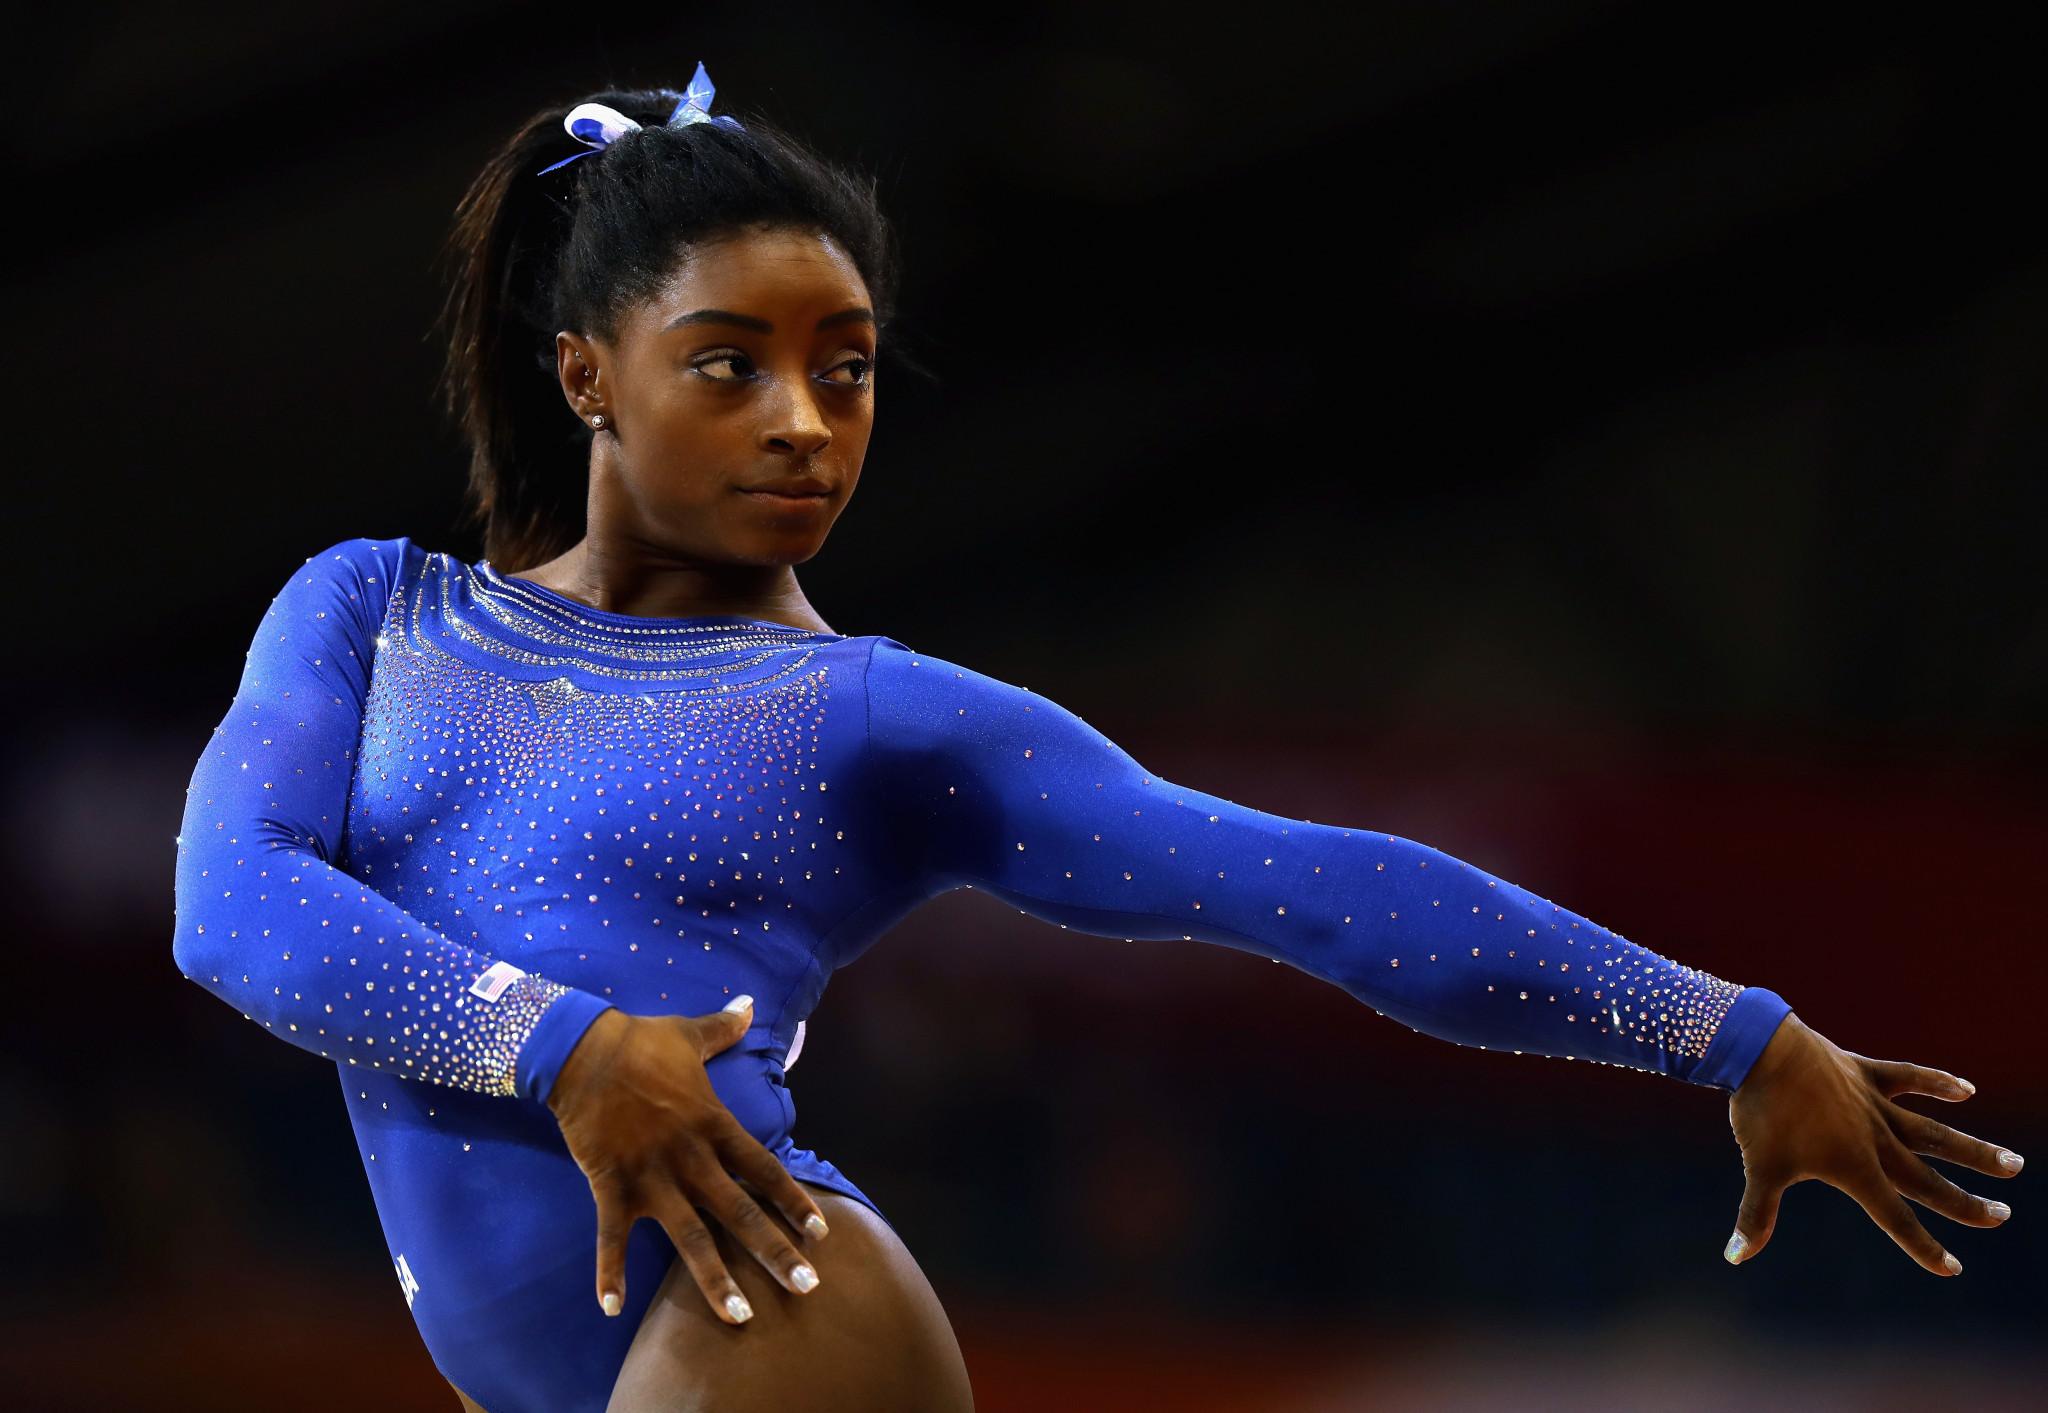 Biles shrugs off kidney stone to shine at World Artistic Gymnastics Championships